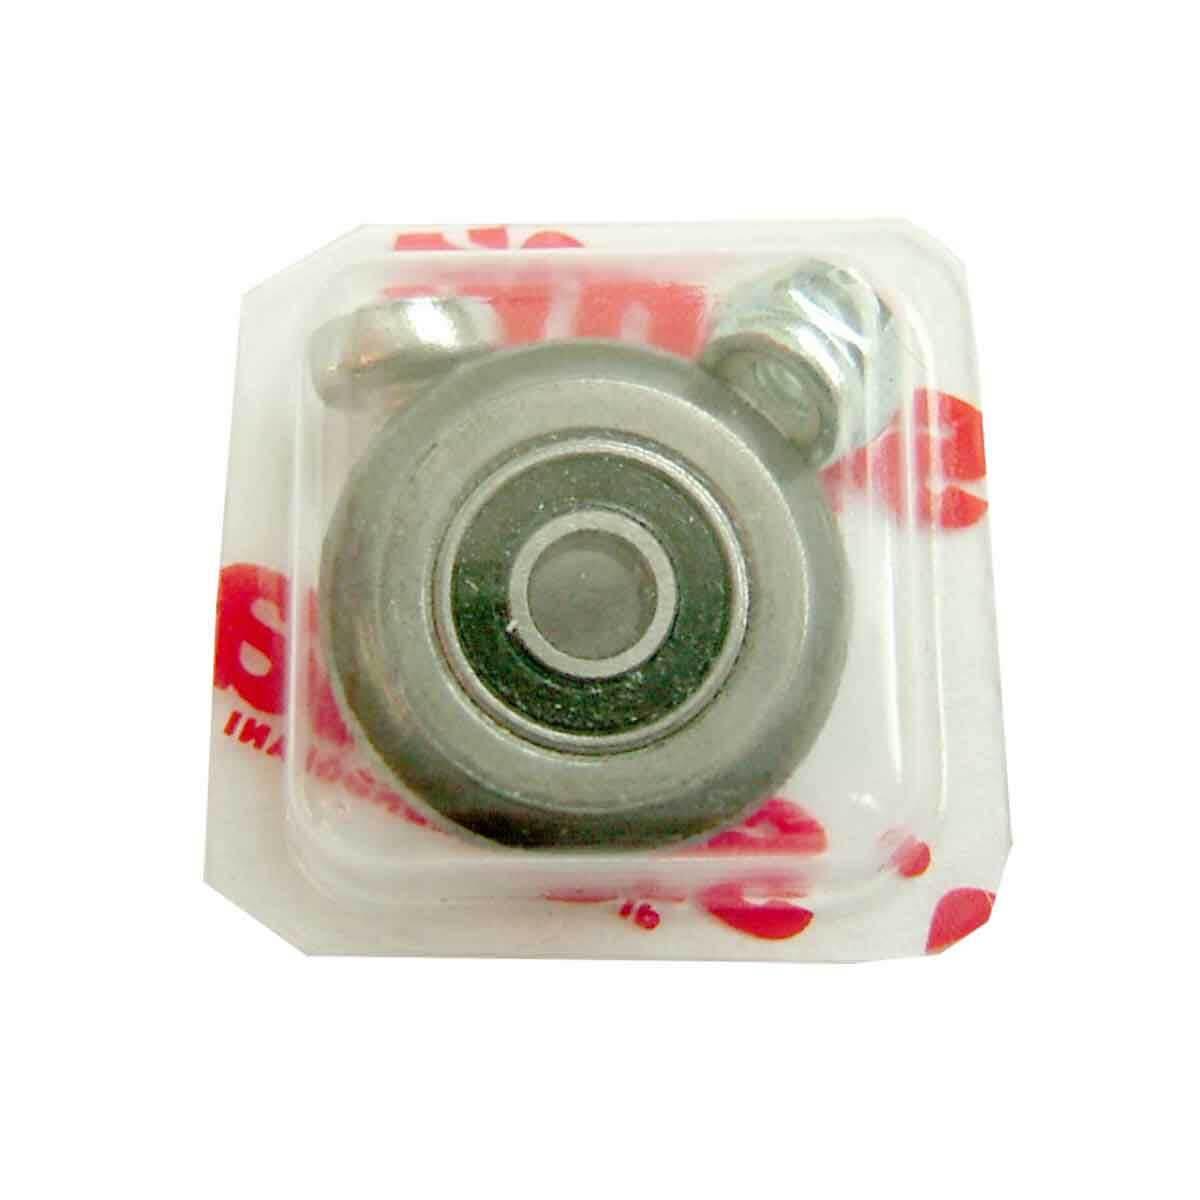 14MX Sigma Scoring Wheel